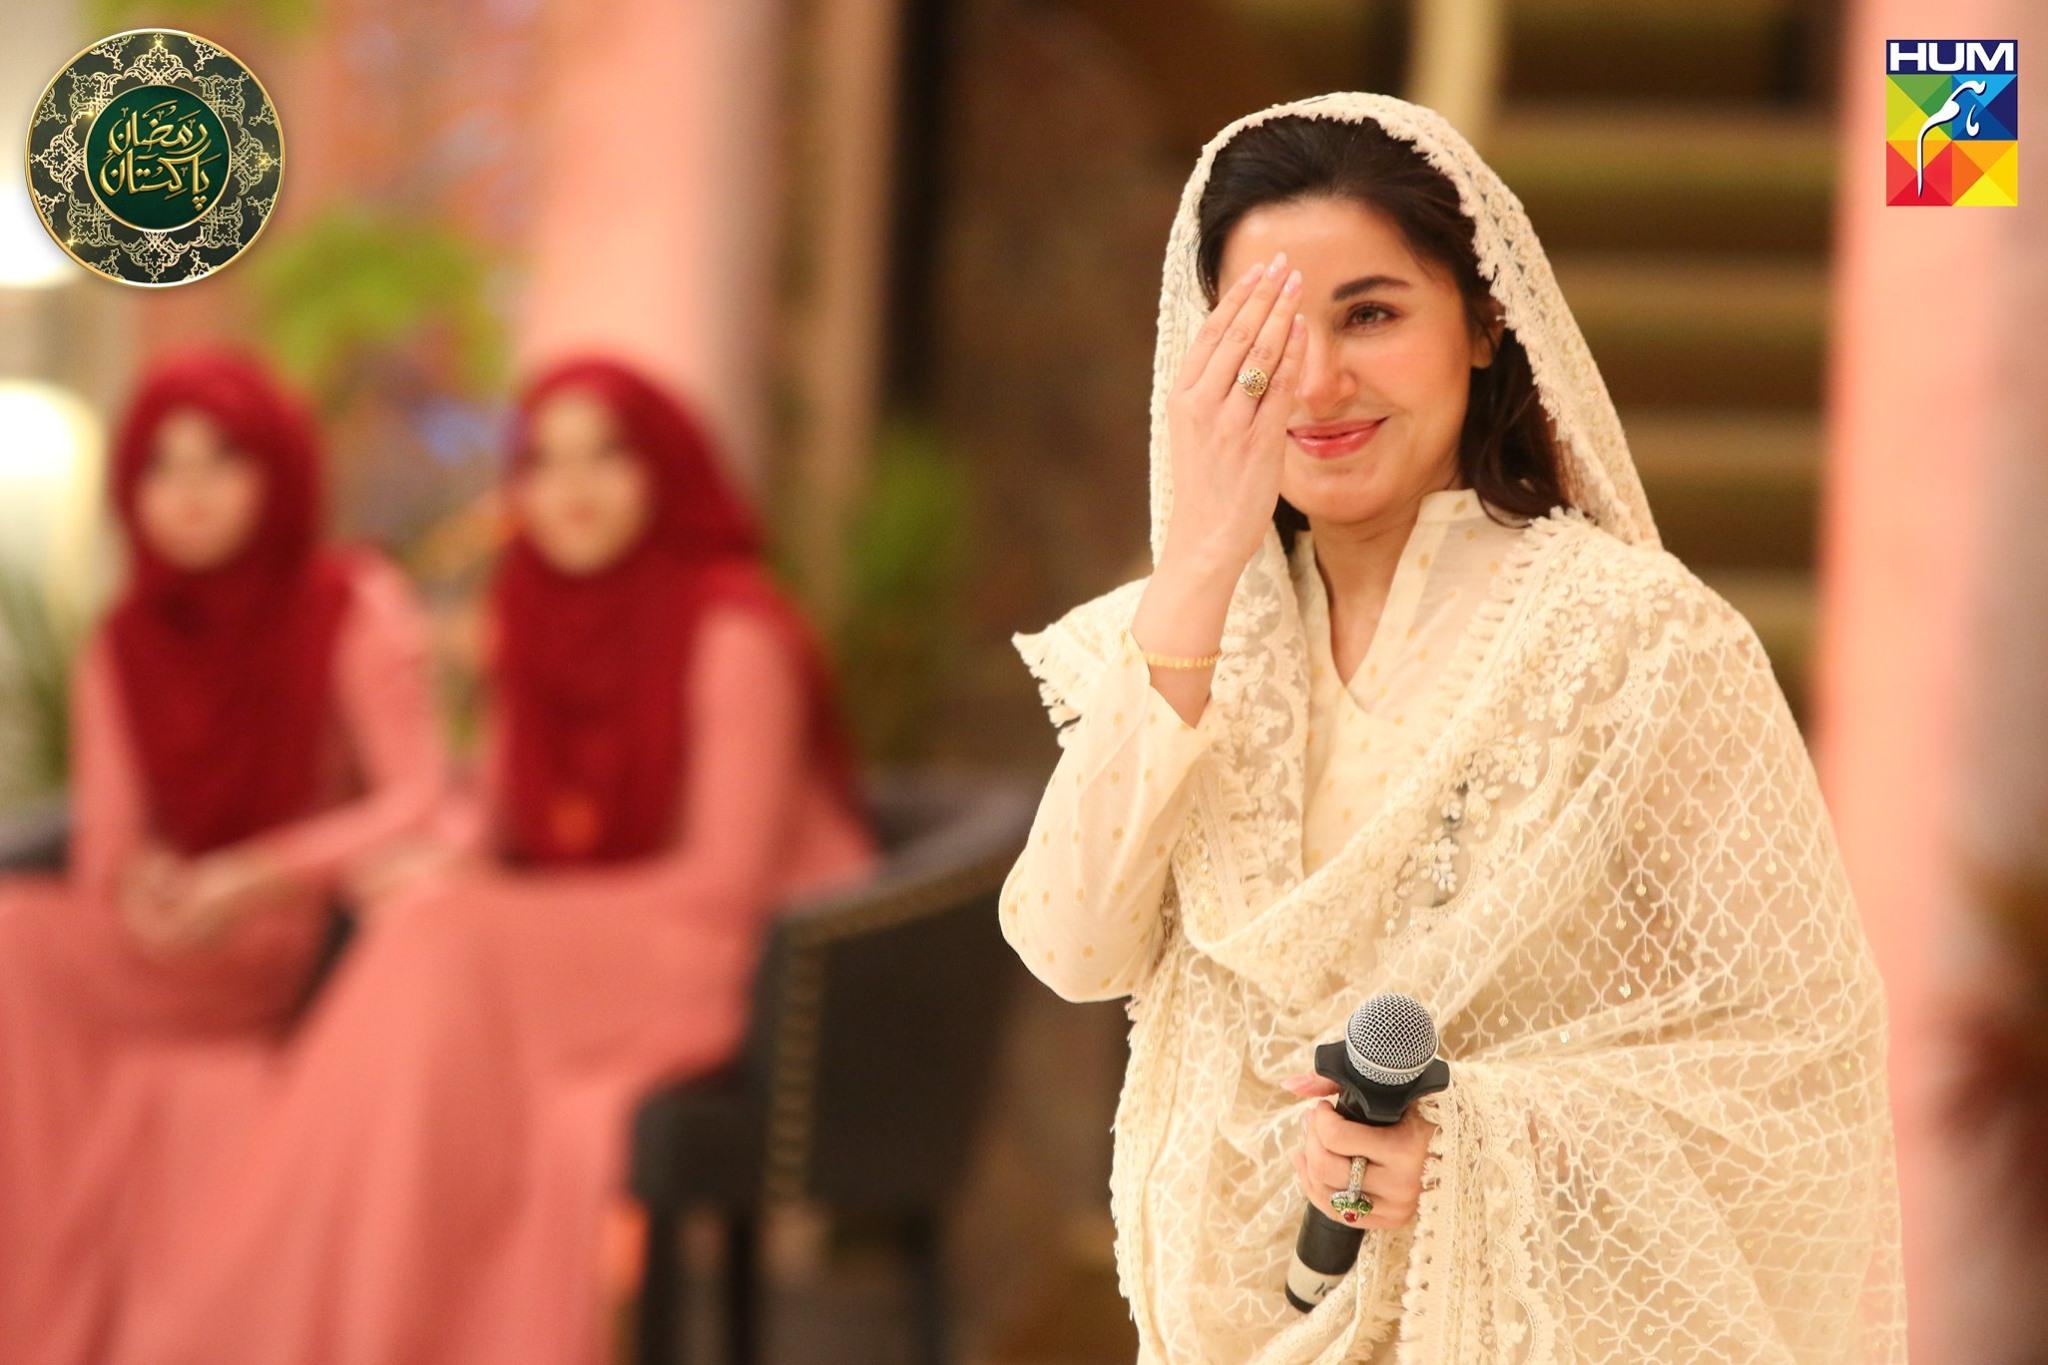 Beautiful Shaista Lodhi Appeared in Ramzan Pakistan Transmission on Humtv